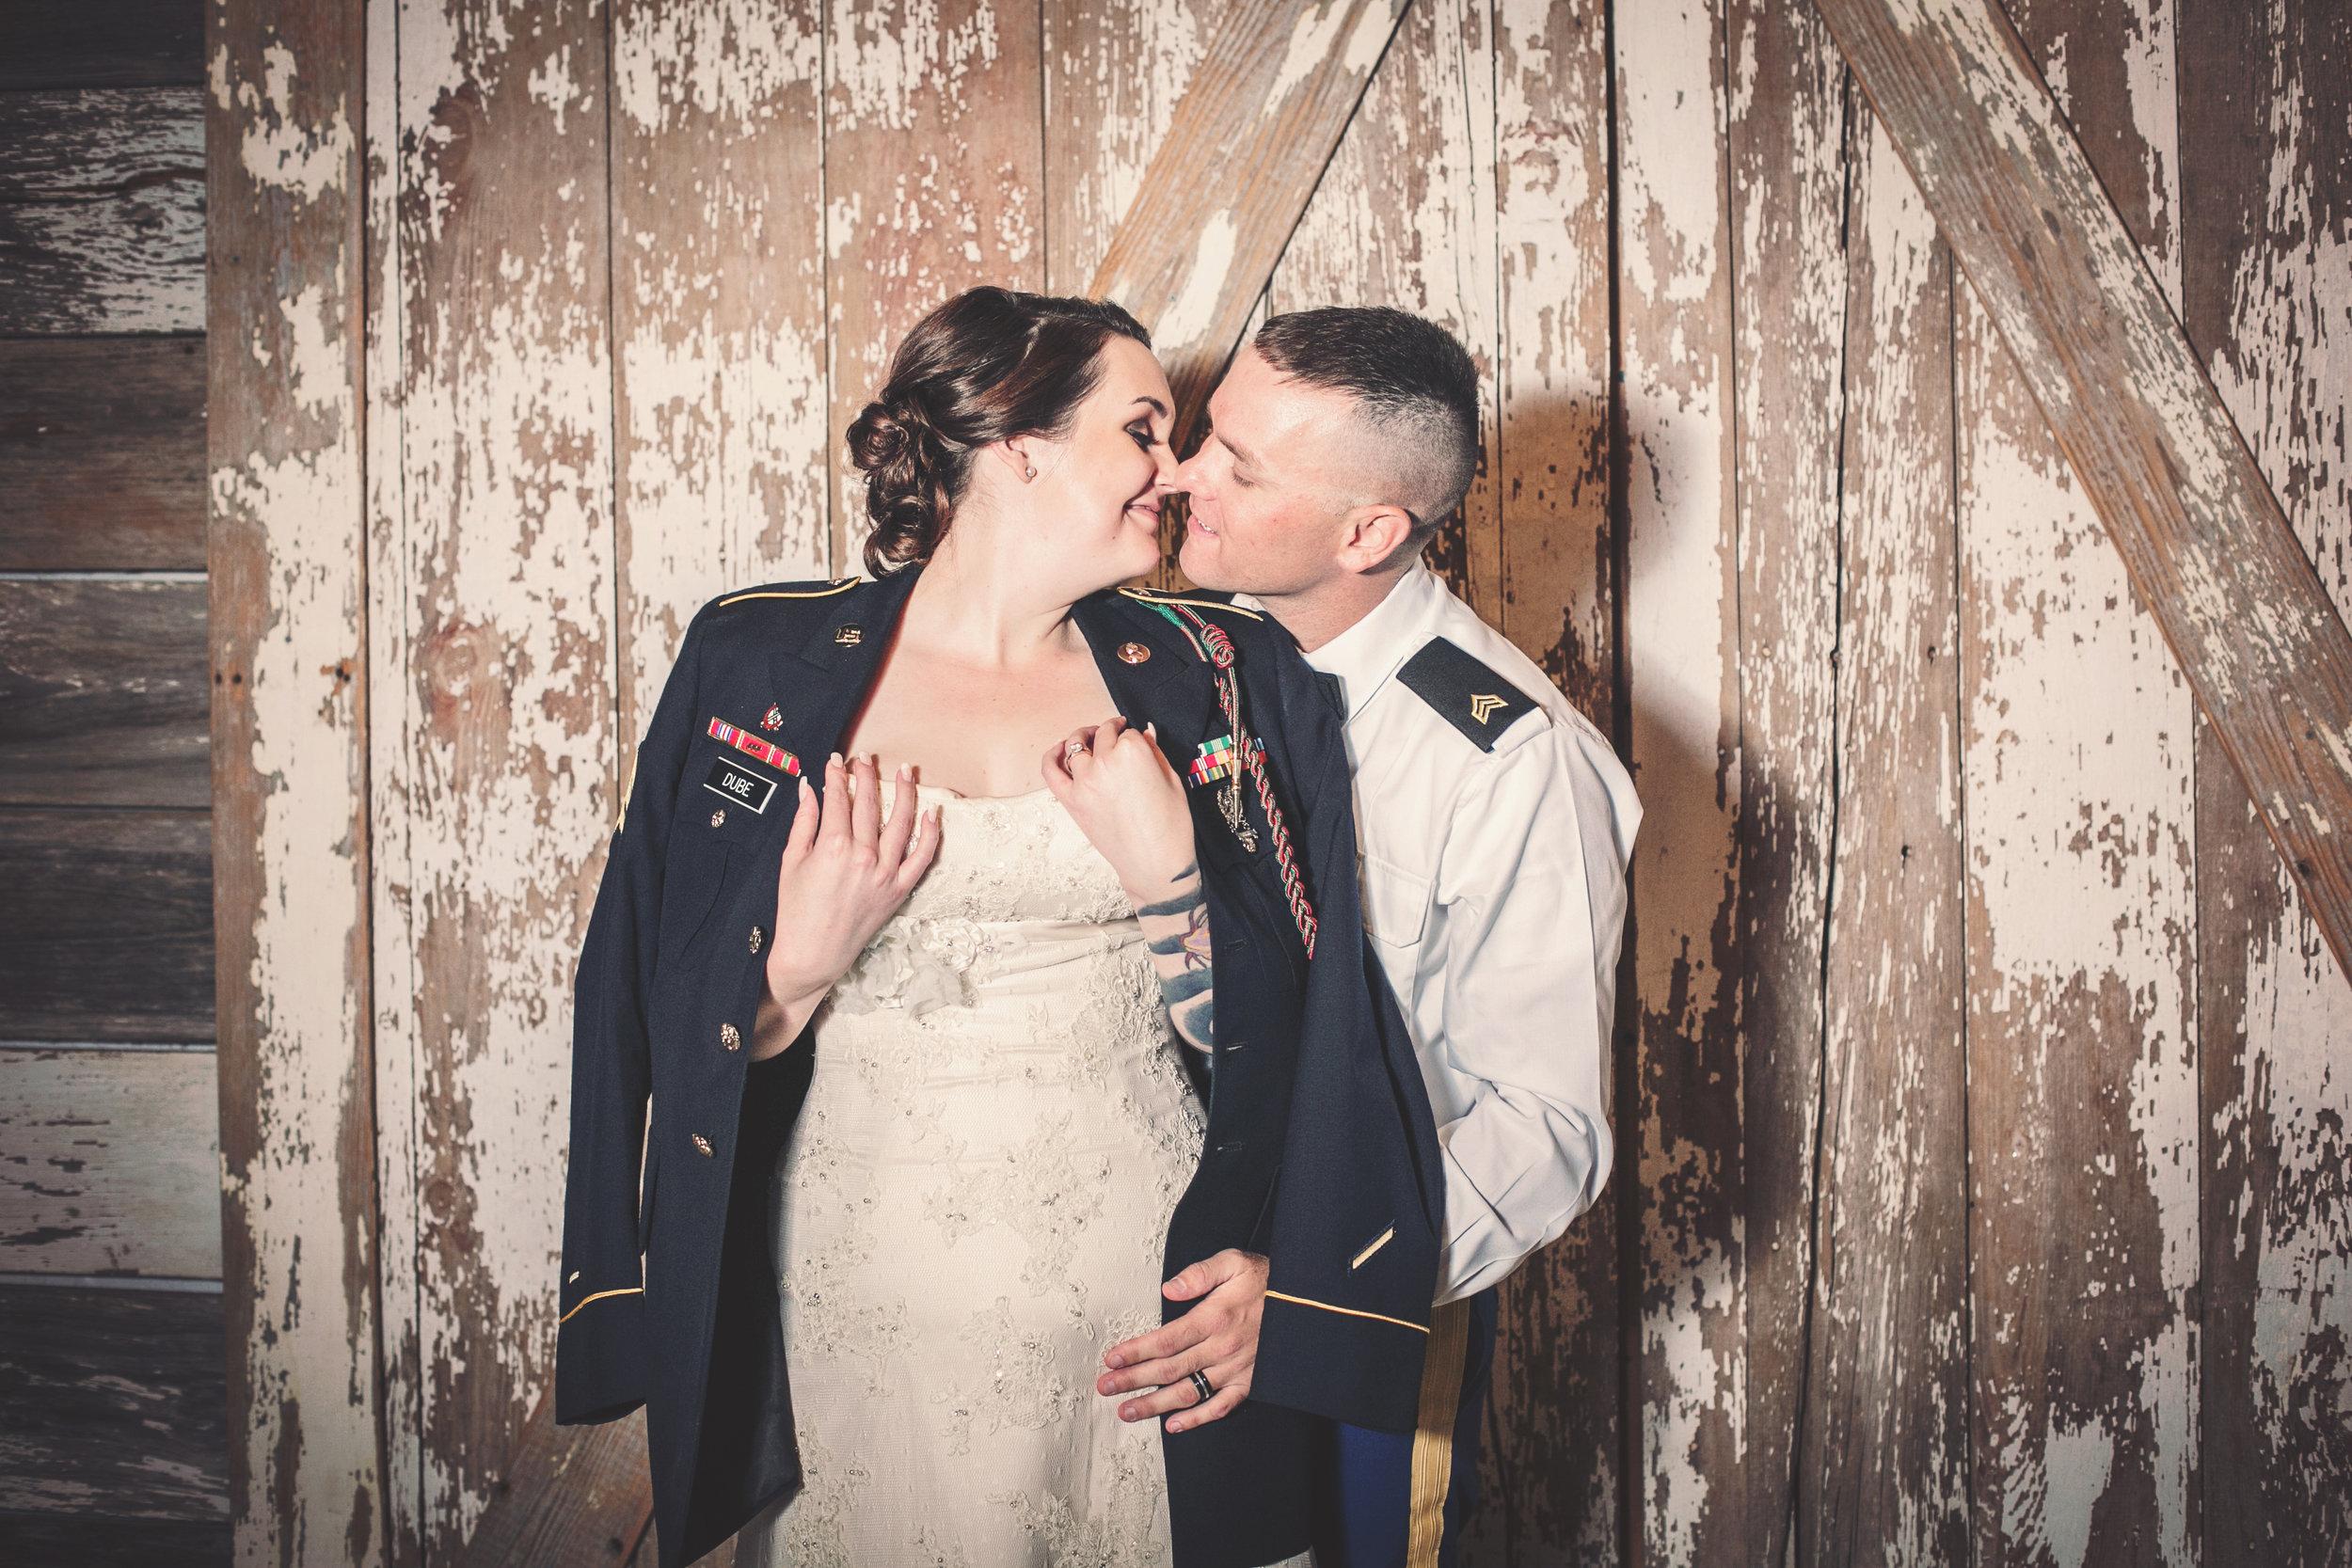 Kansas+City-Small+Wedding_Venue_Elope_Intimate_Ceremony_Memorial+Day_6.jpg